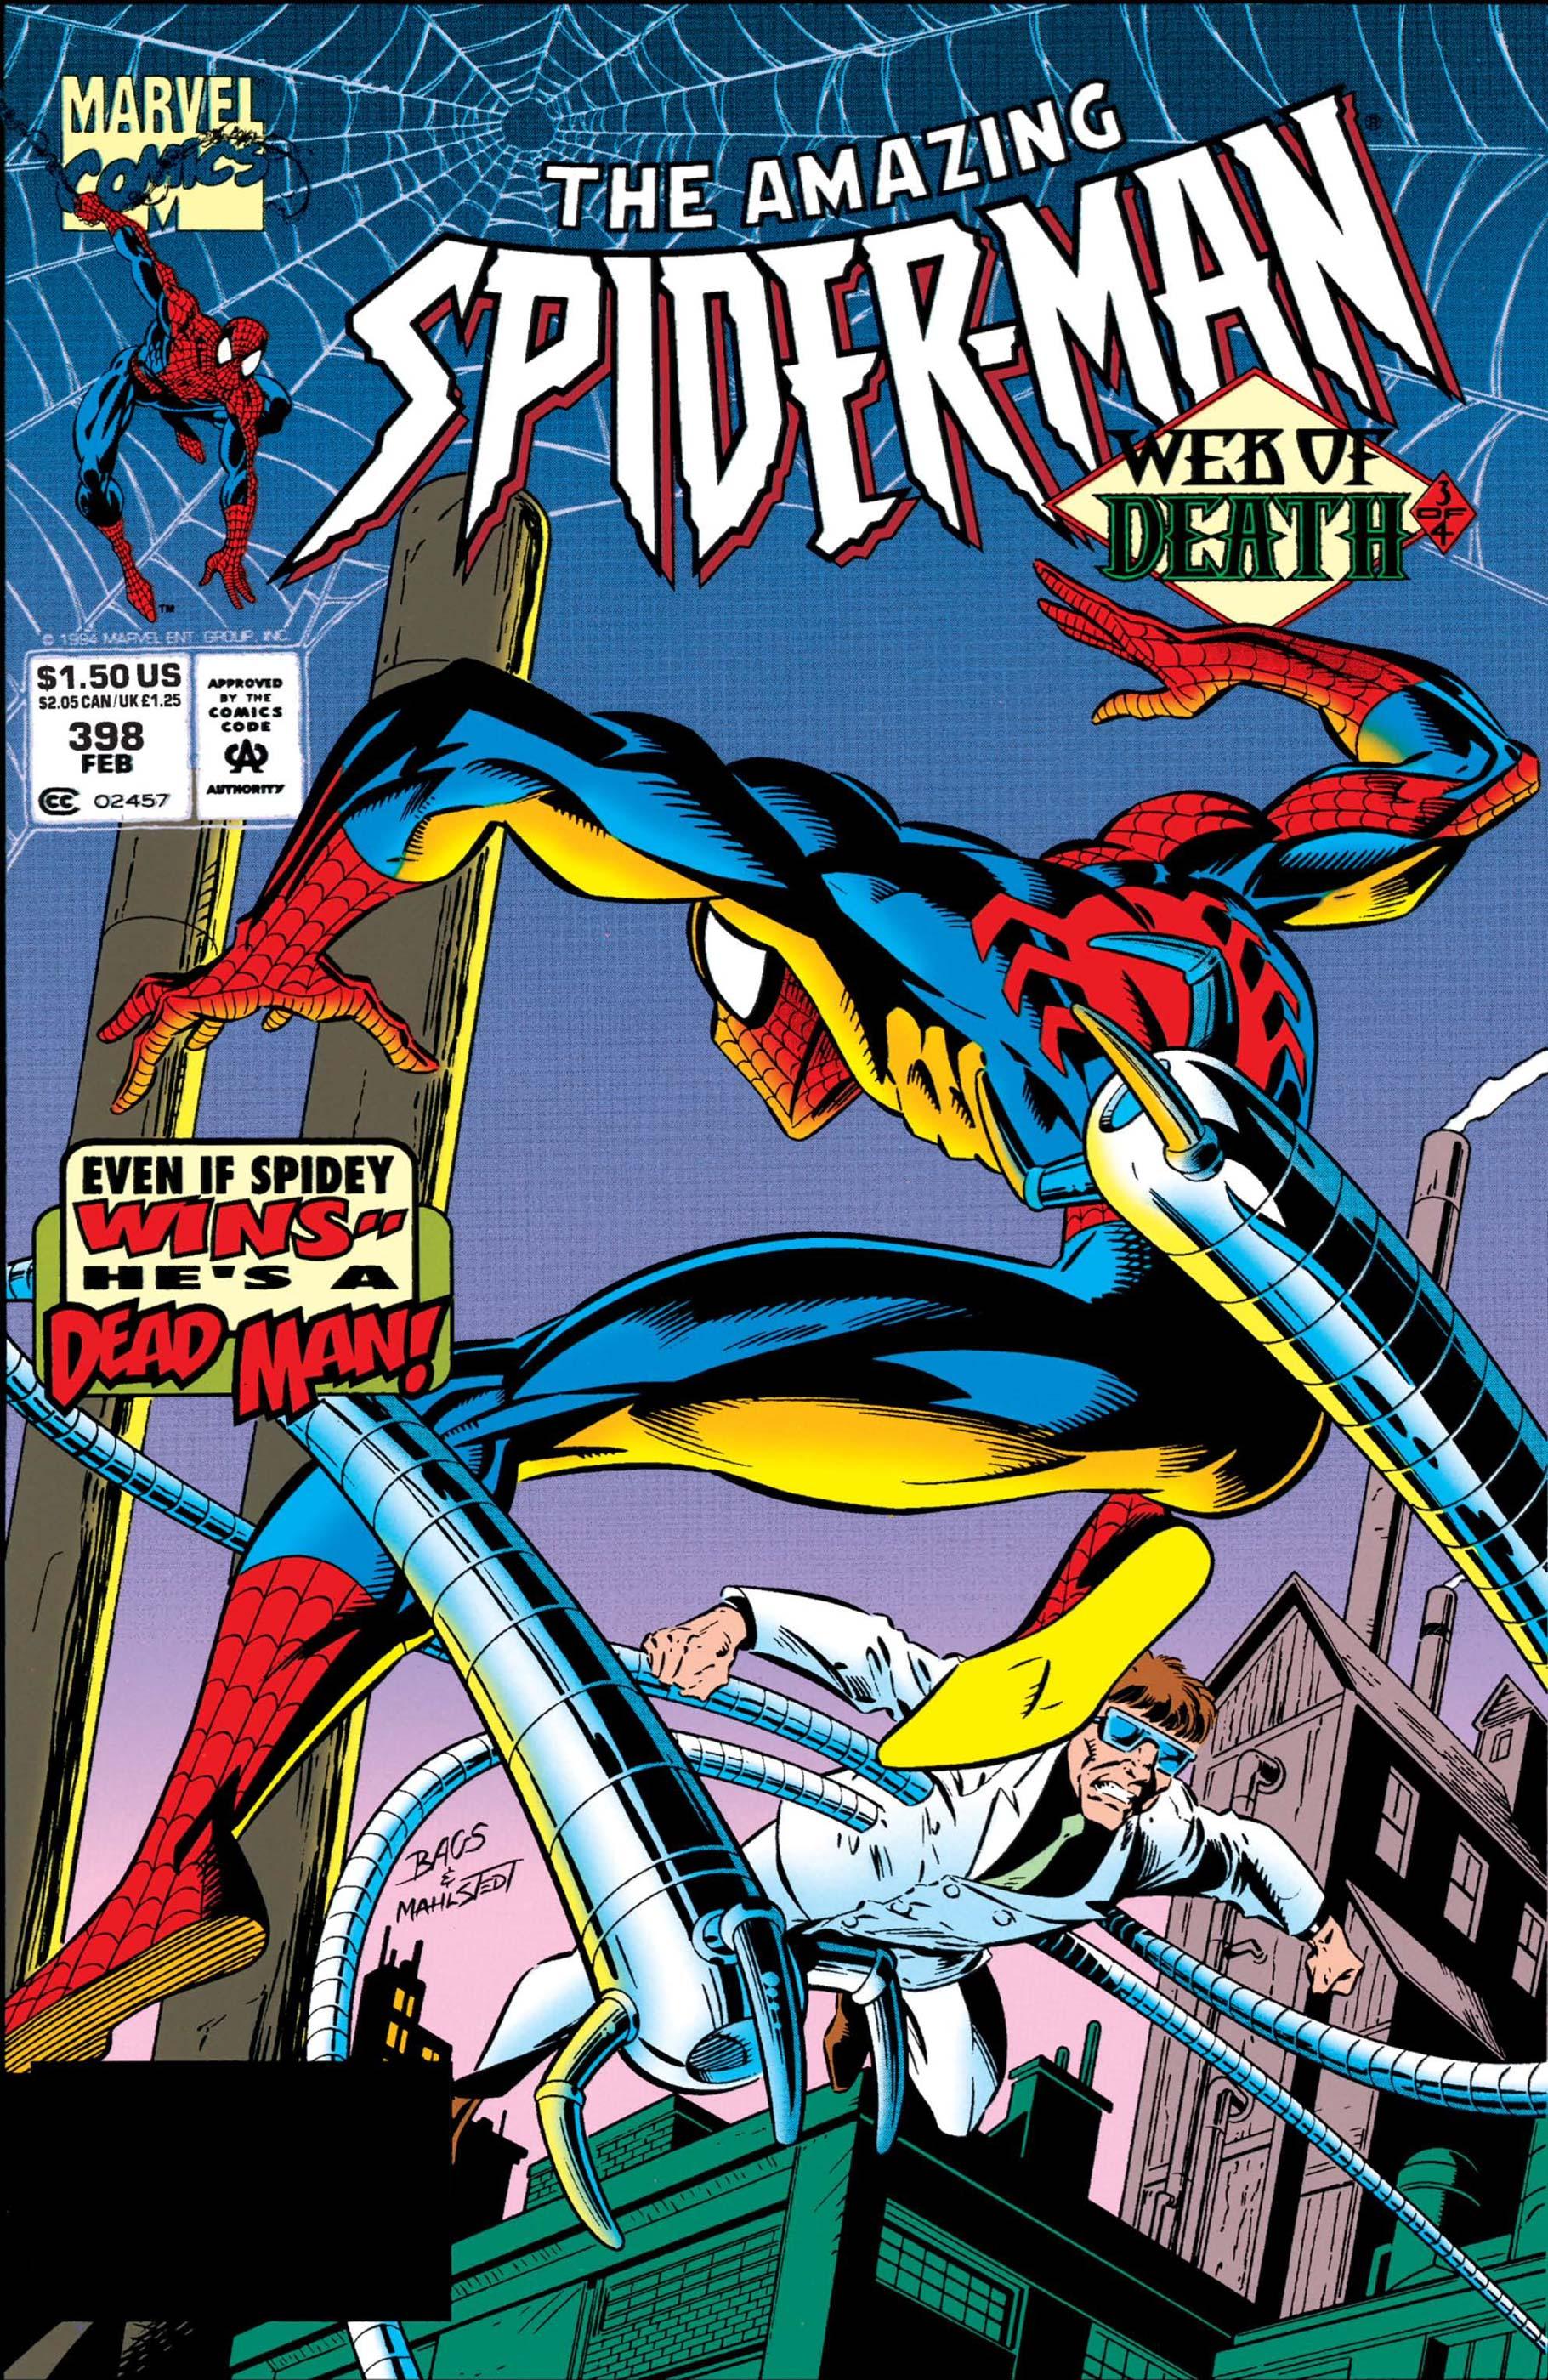 The Amazing Spider-Man (1963) #398